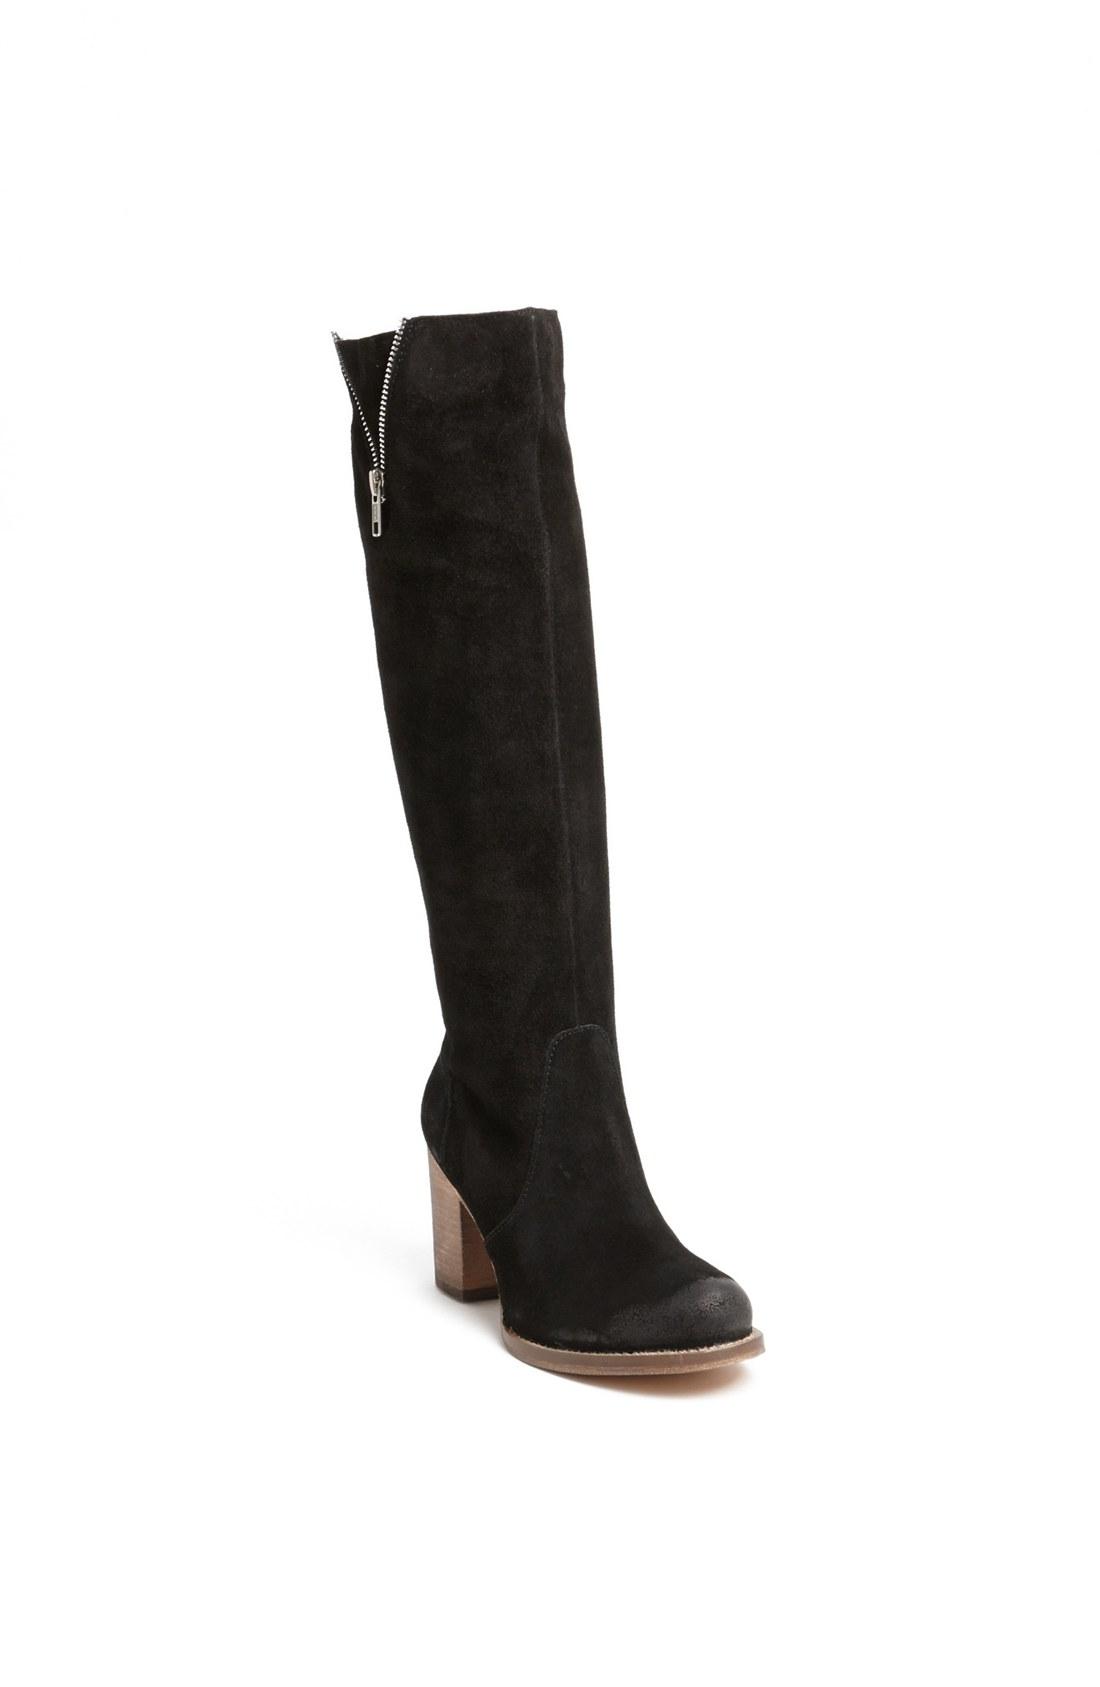 charles by charles david libre boot in black black